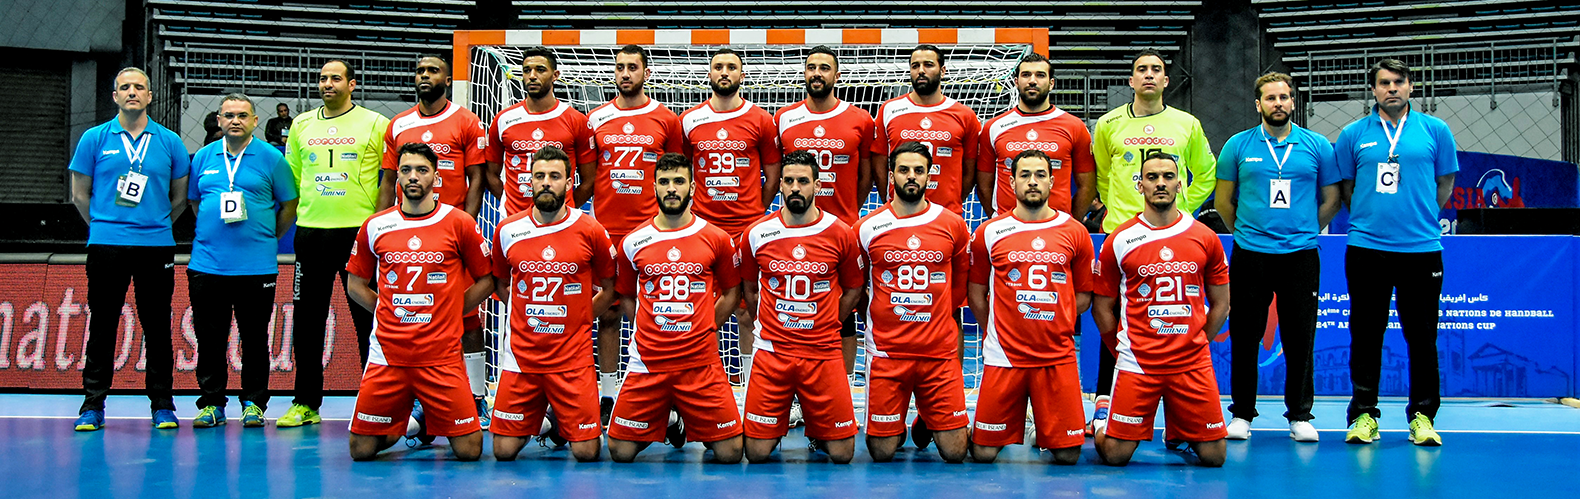 Équipe Tunisie Handball